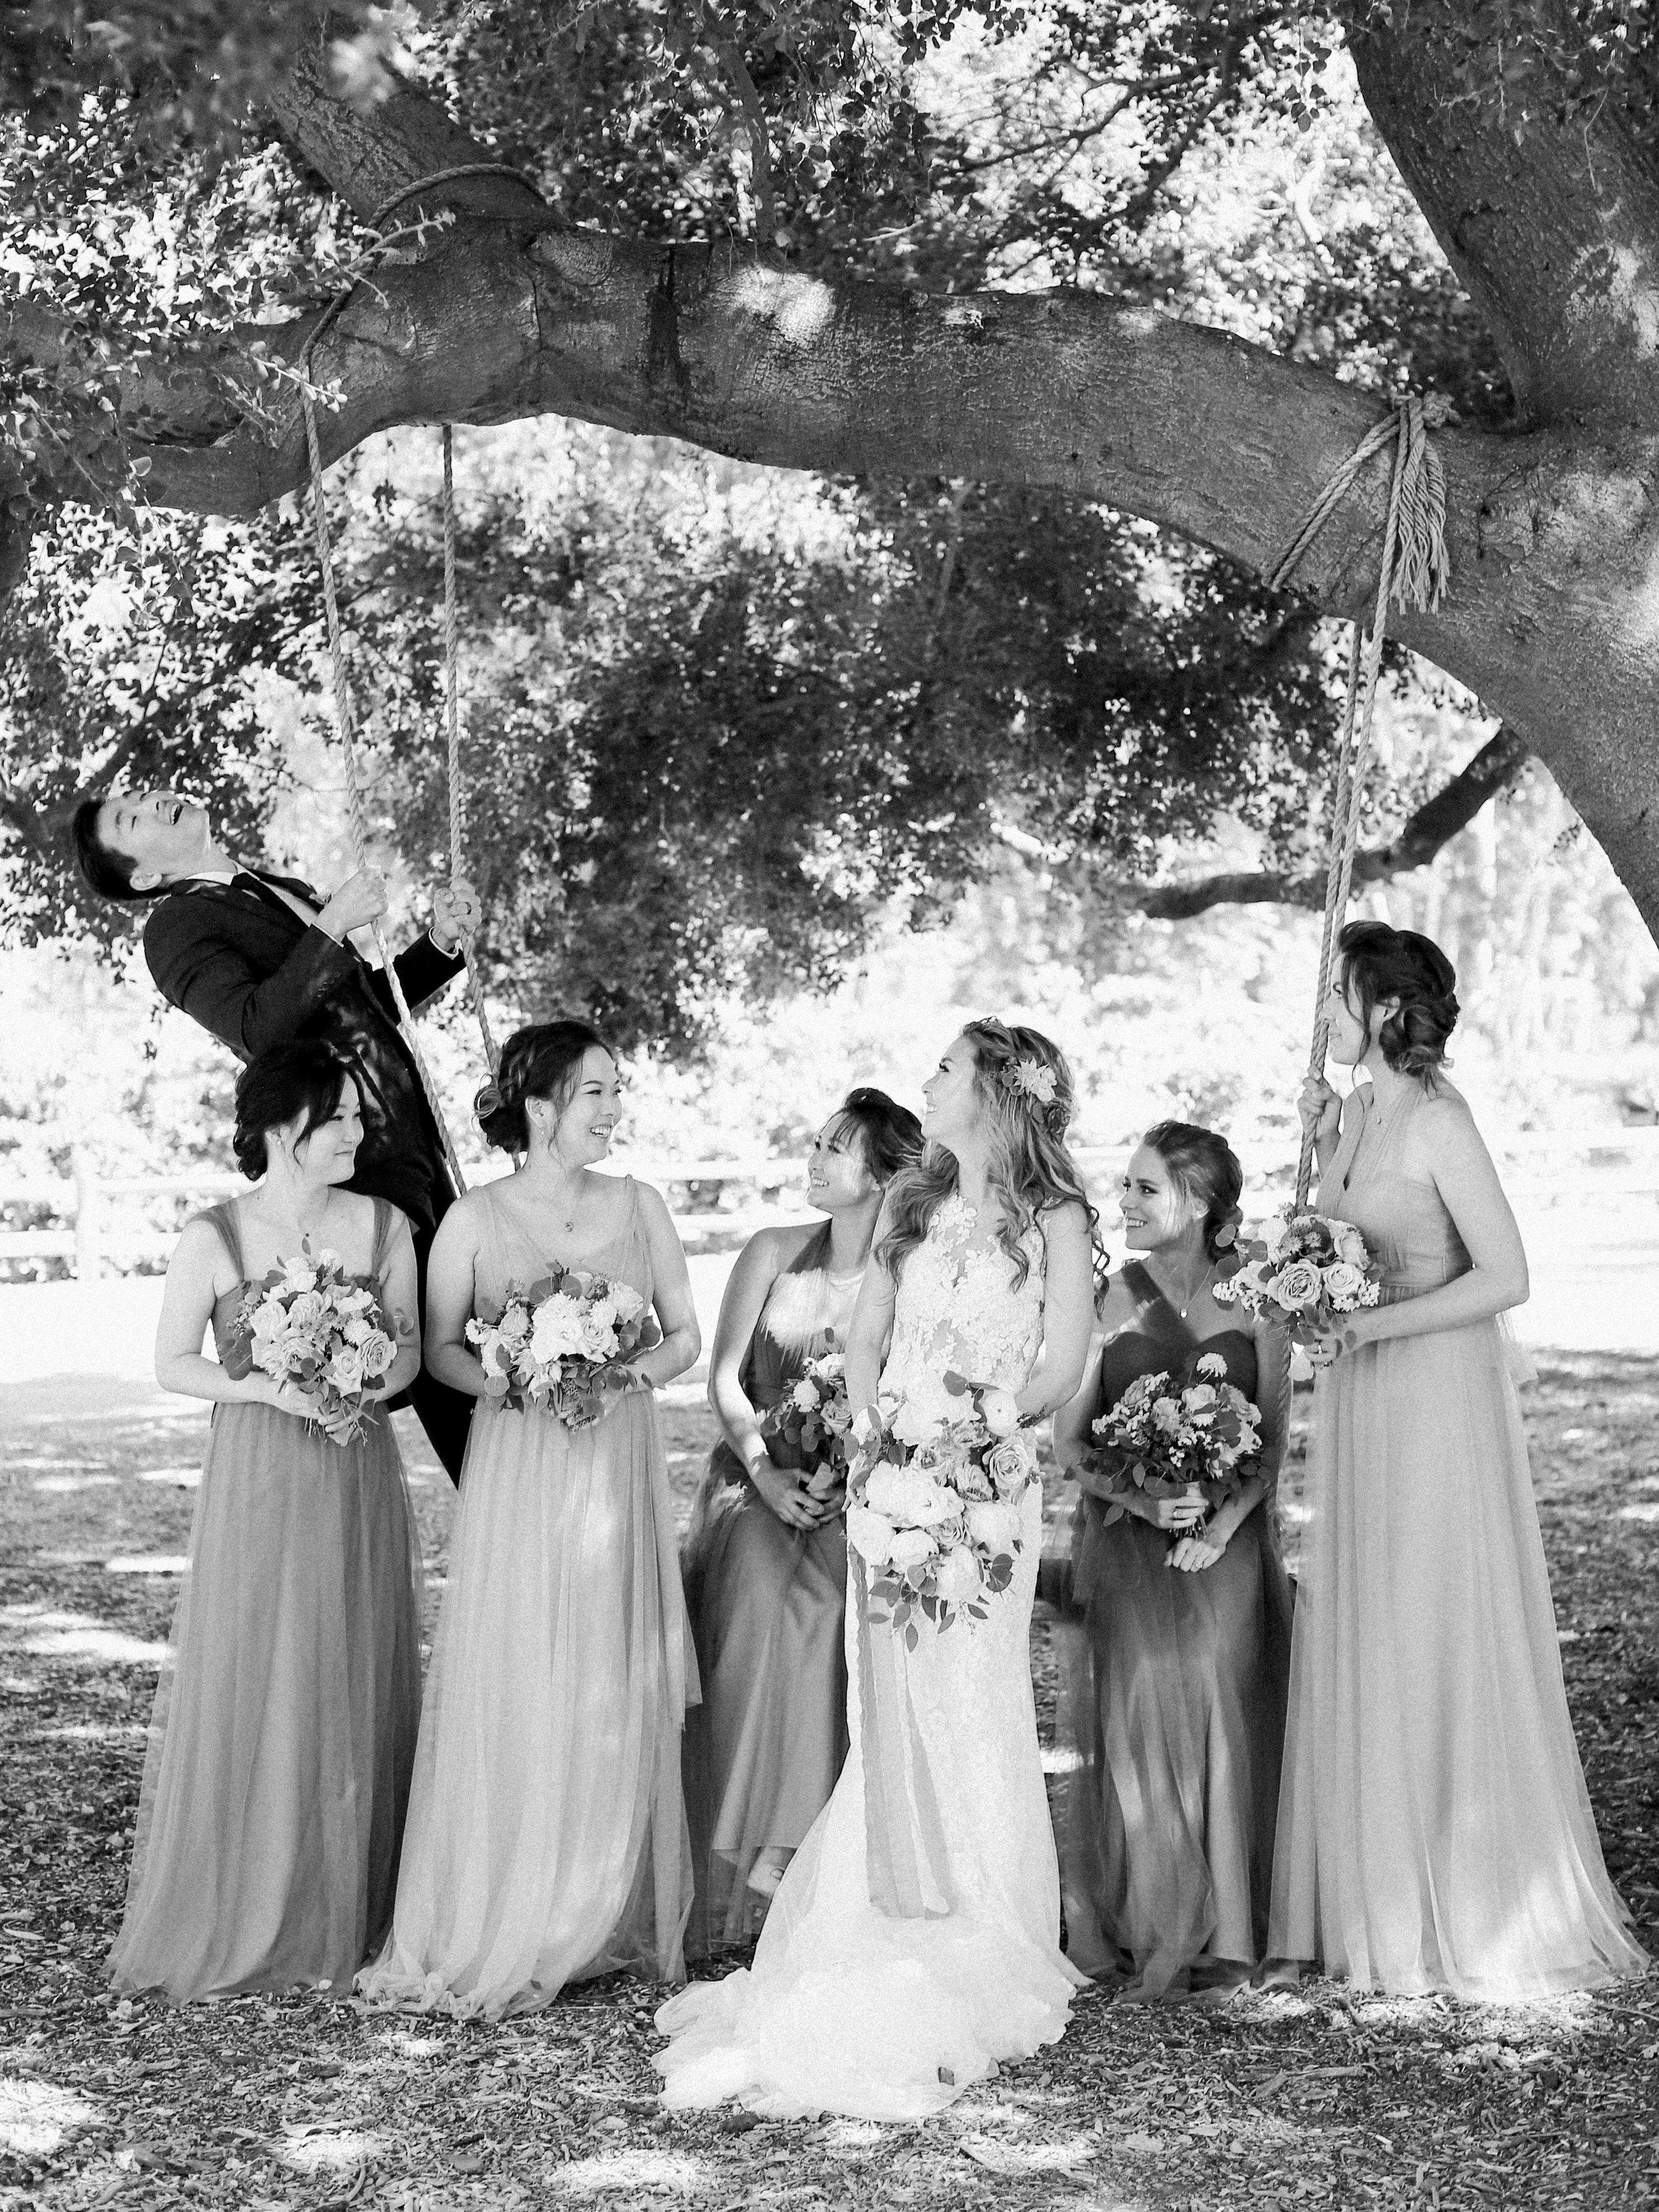 Triunfo_Creek_Winery_Wedding-133-Jen-Huang-JL-721-Jen-Huang-JHP_9996.jpg